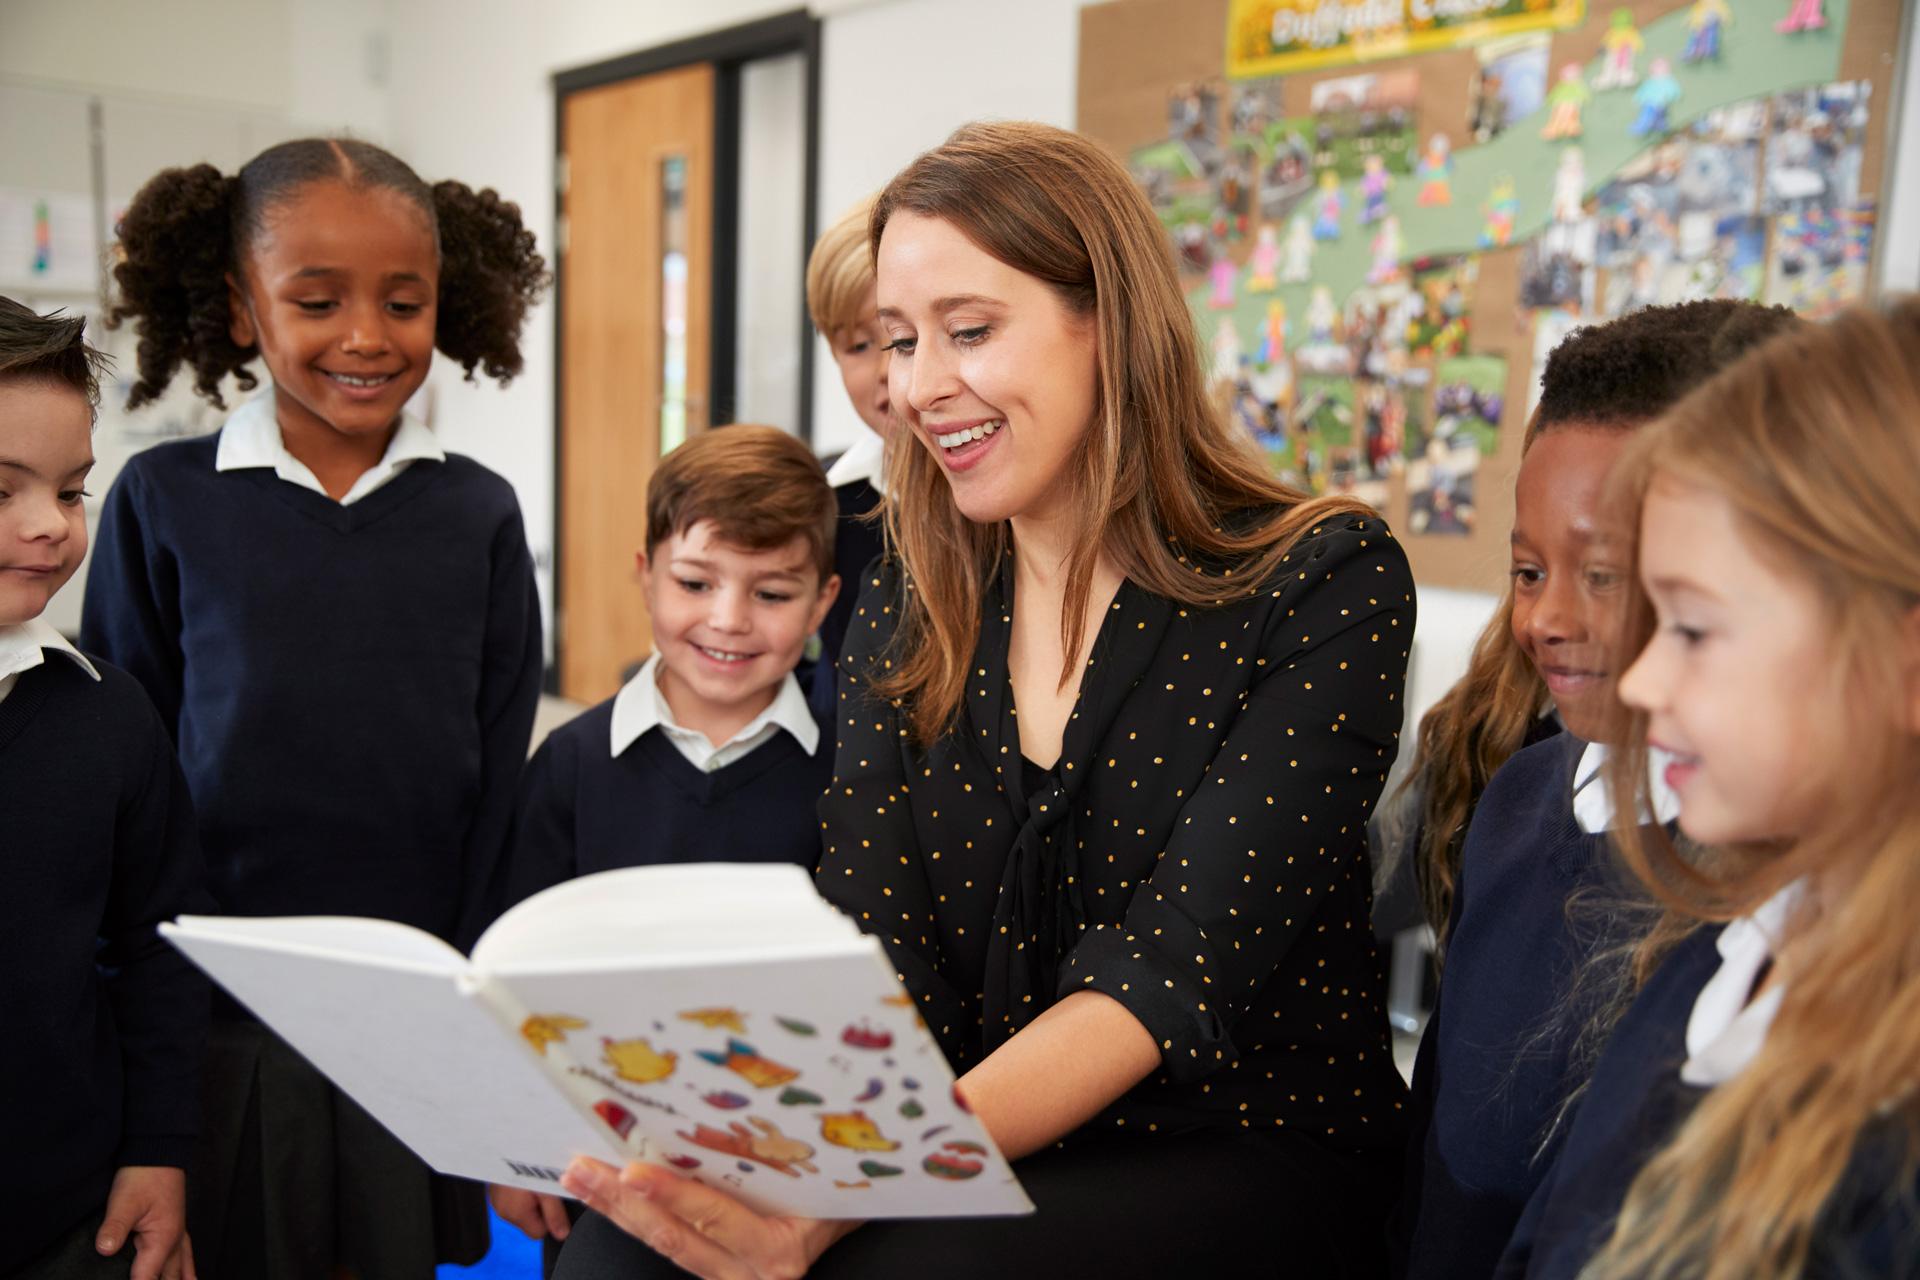 female-primary-school-teacher-reading-to-a-class-C65QJRL.jpg